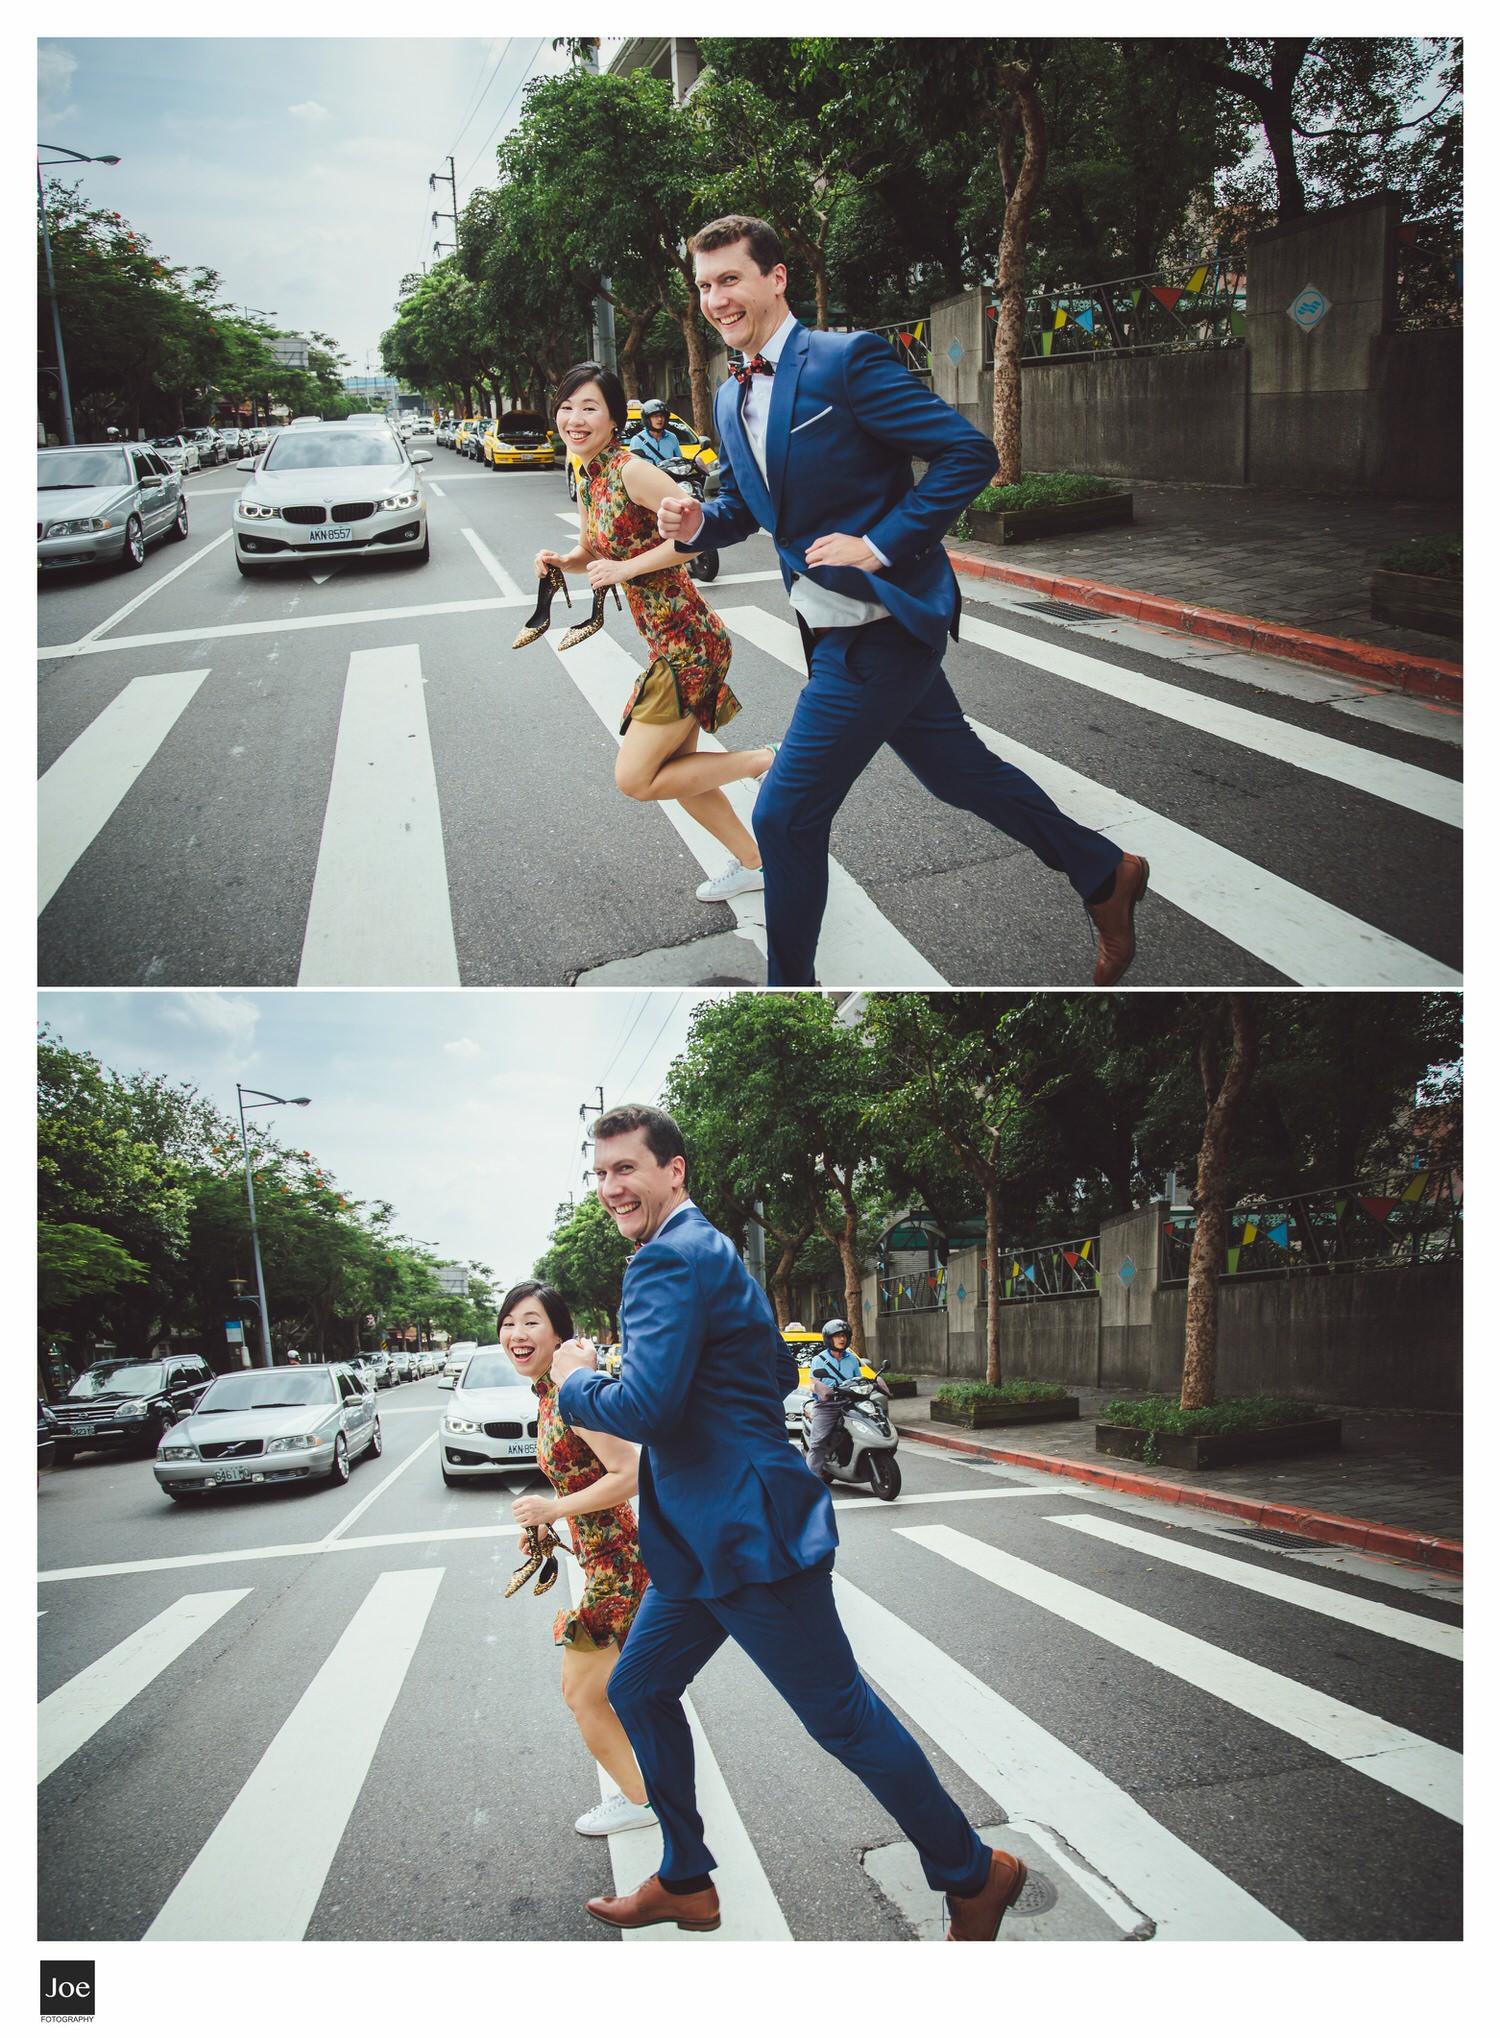 joe-fotography-pre-wedding-kay-jeff-034.jpg